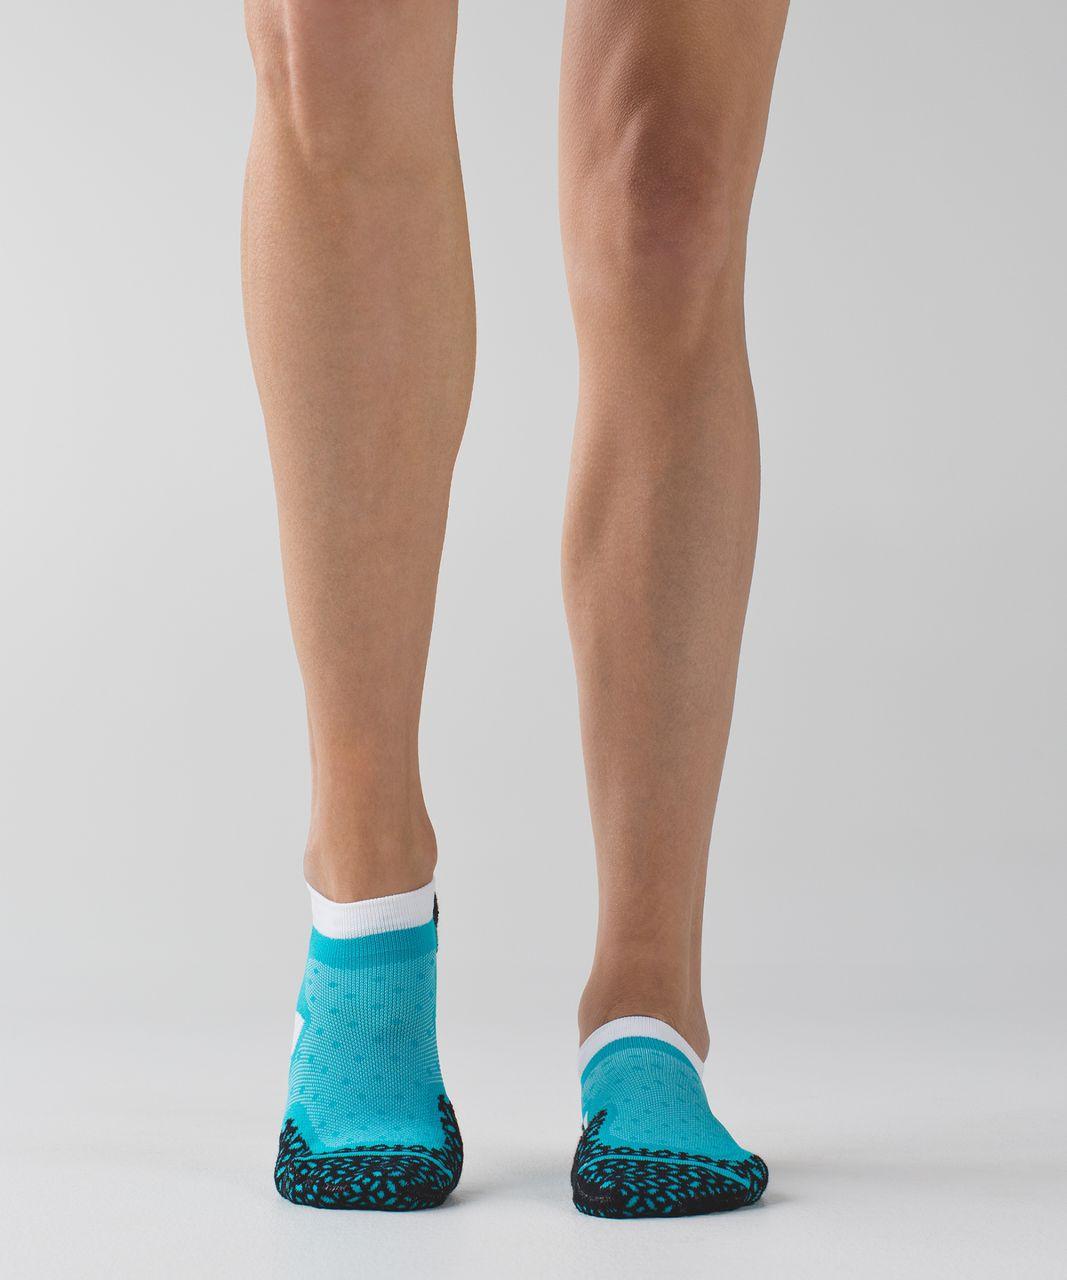 Lululemon Speed Sock - Peacock Blue / Naval Blue